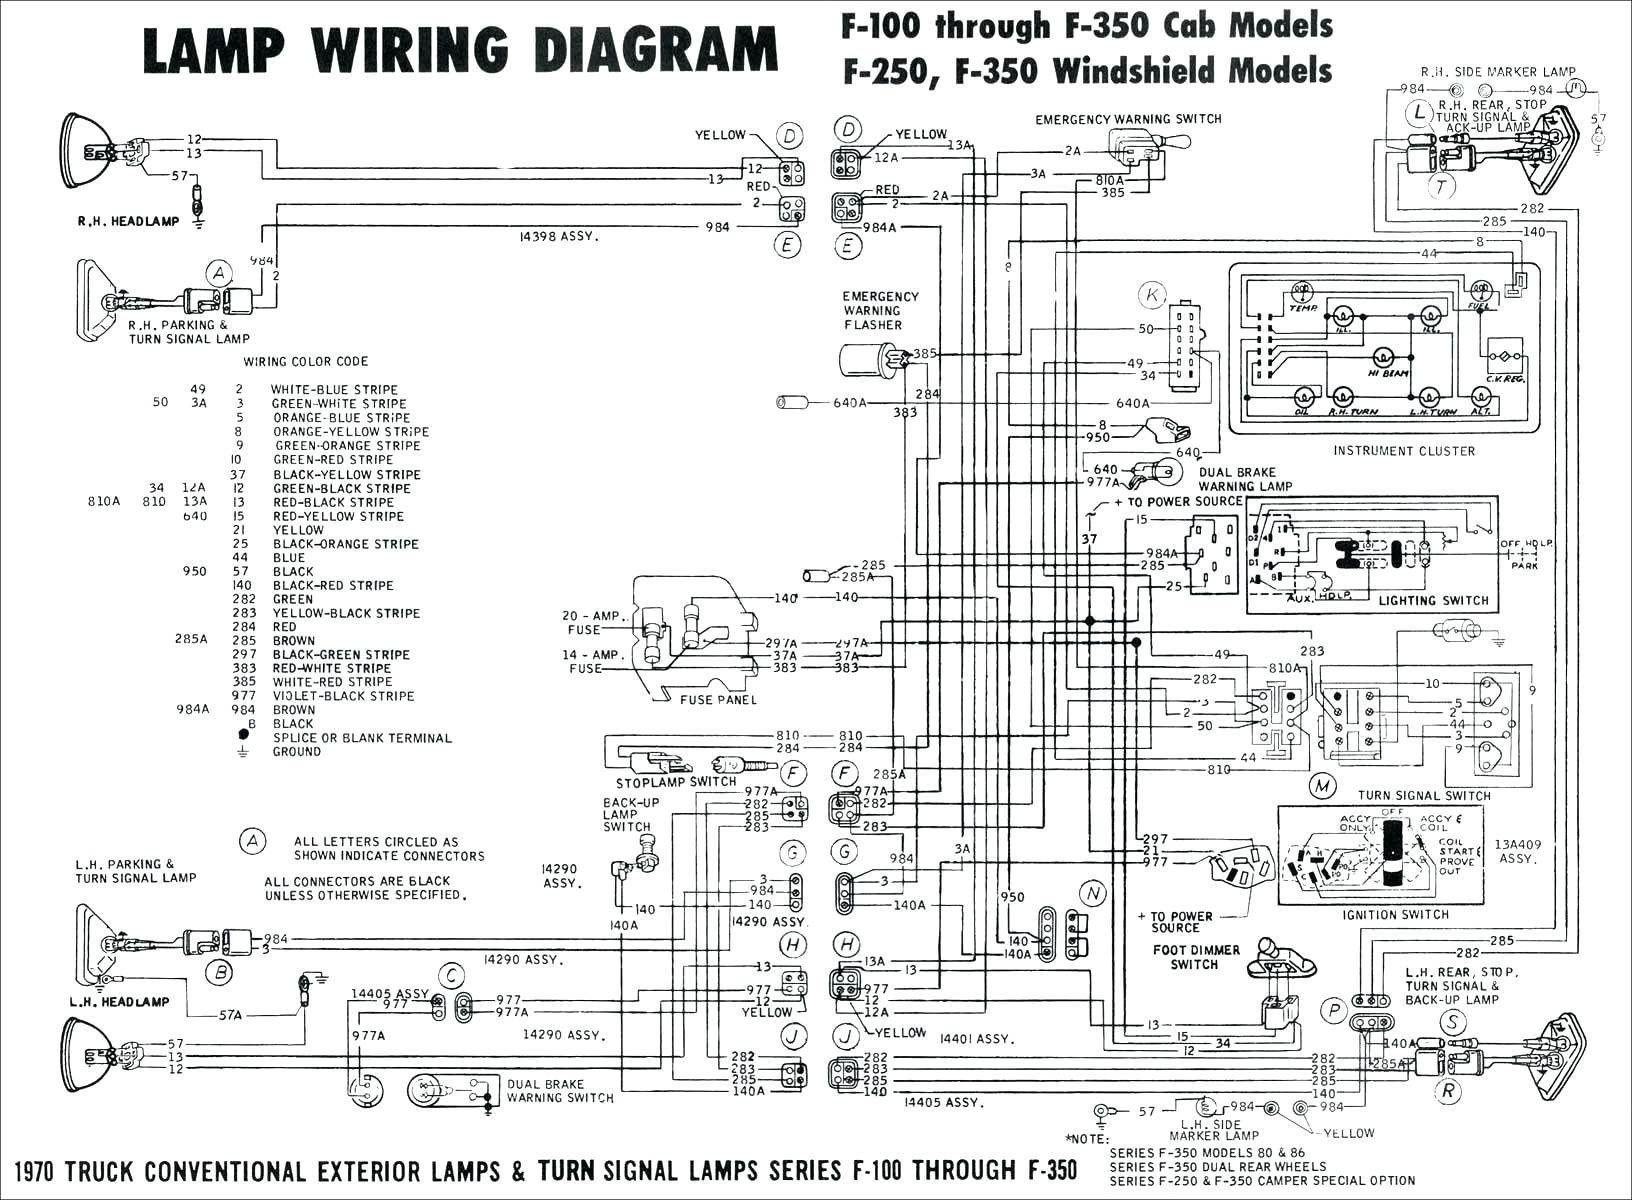 Superb 2002 Dodge Stratus Relay Diagram Electrical Wiring Diagram Software Wiring Cloud Unhoicandsaprexeroixtuhyedimohammedshrineorg